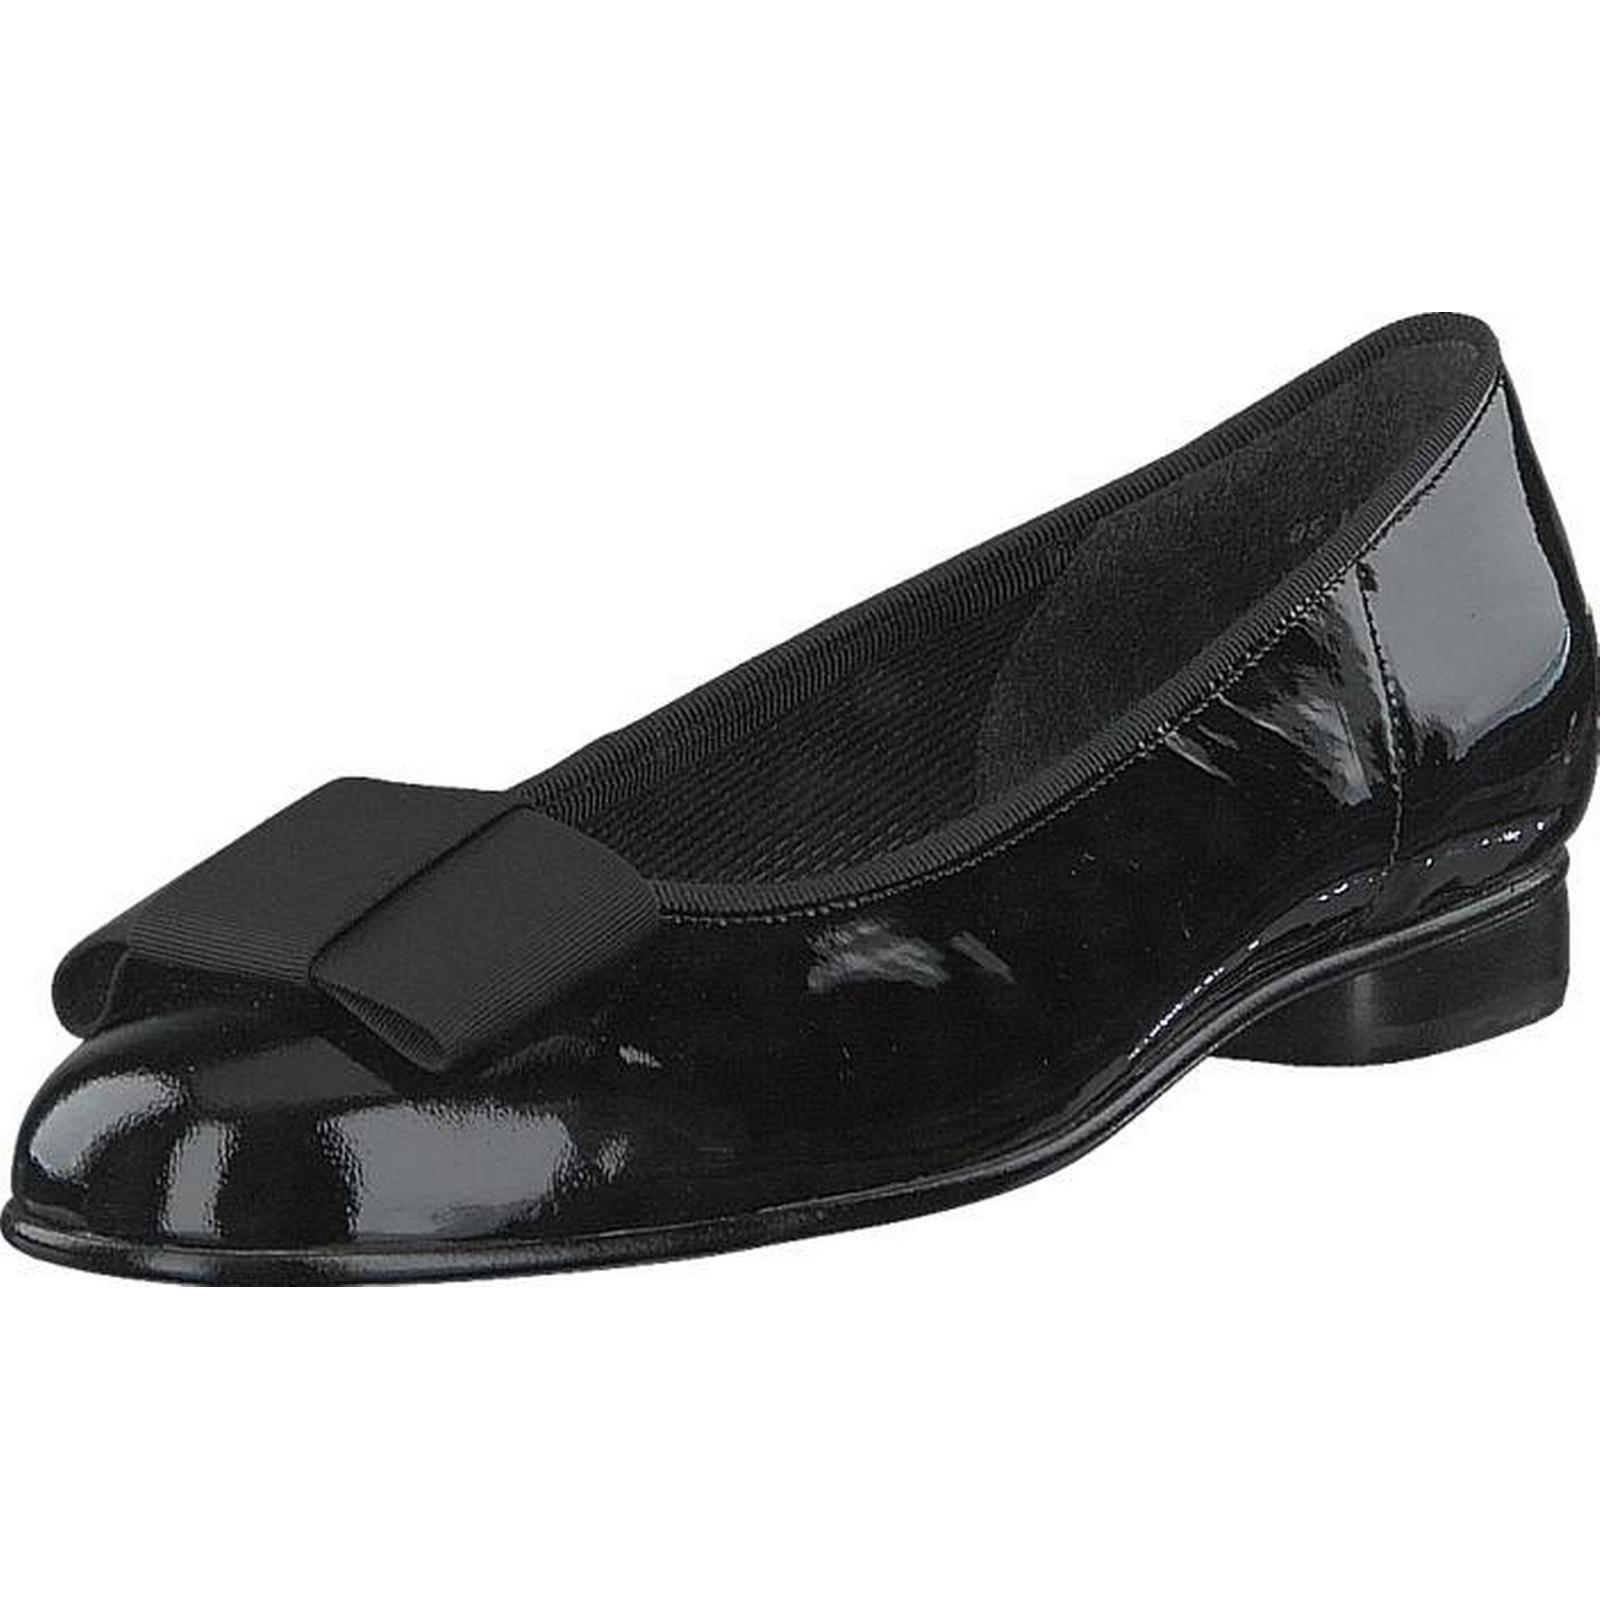 Gabor 05.100-97 Black Black, Shoes, Flats, Ballerina Shoes, Black, Black, Shoes, Female, 37 079014